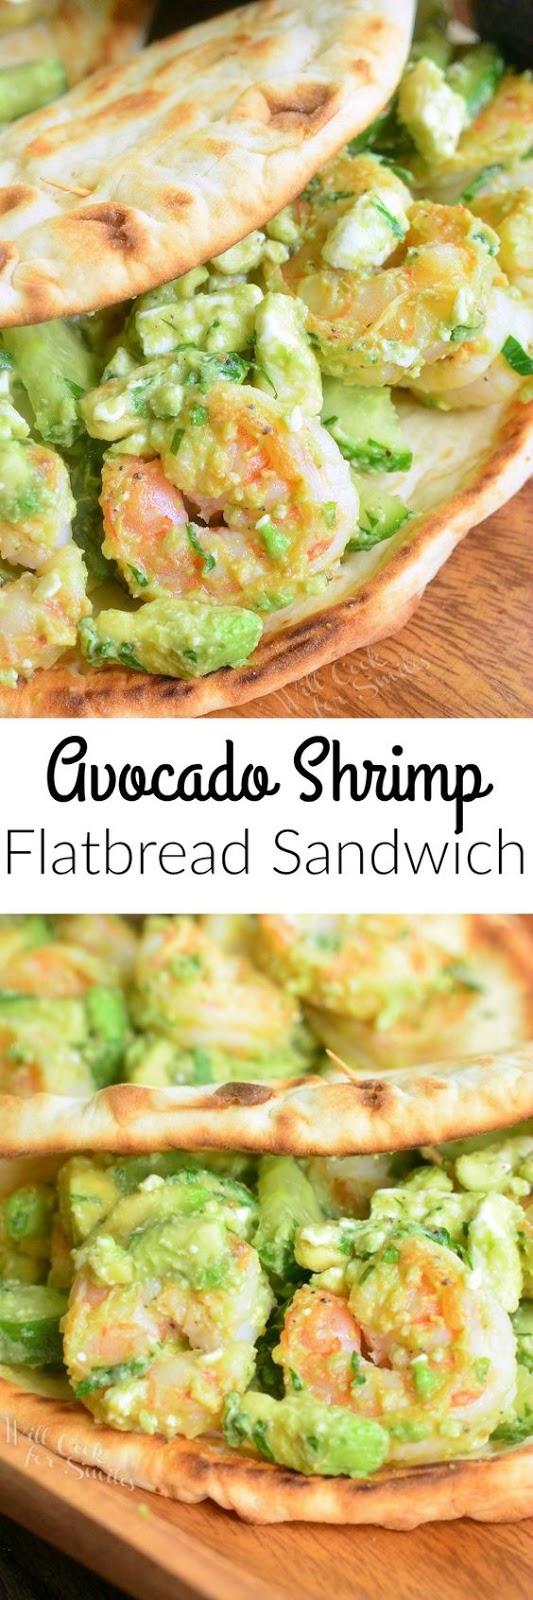 Avocado Shrimp Flatbread Sandwich